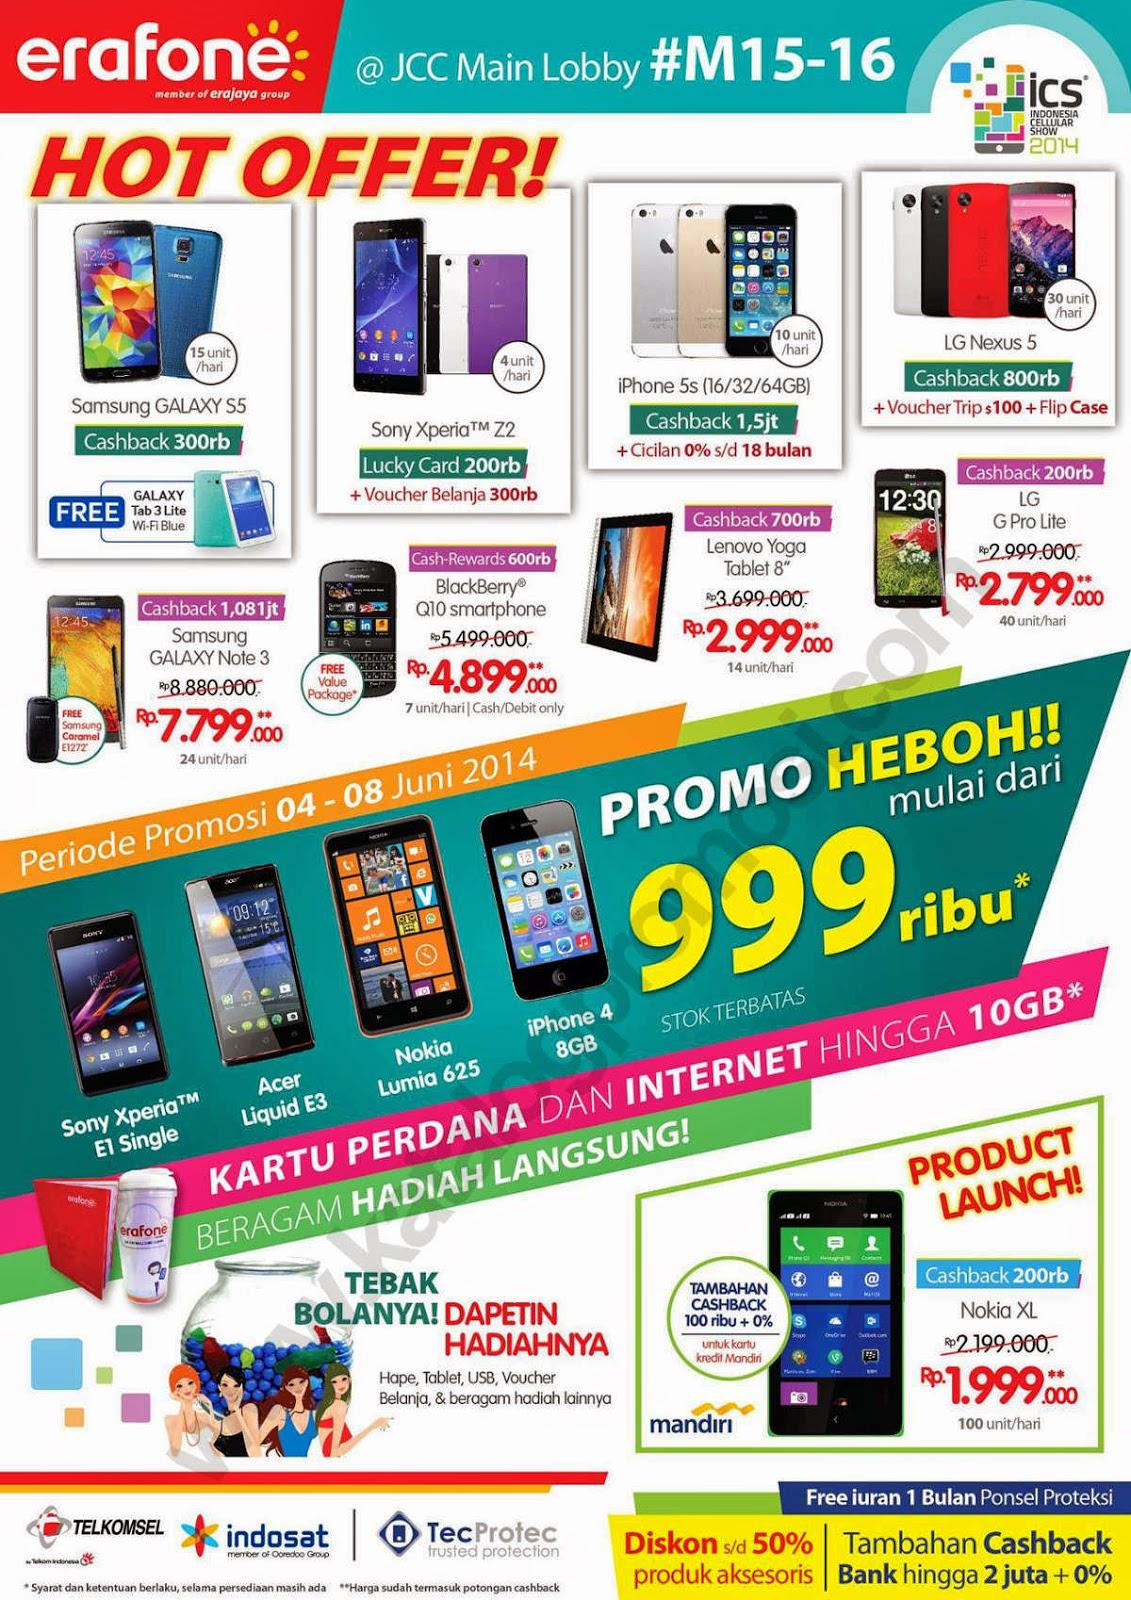 Daftar Promo Erafone di ICS 2014